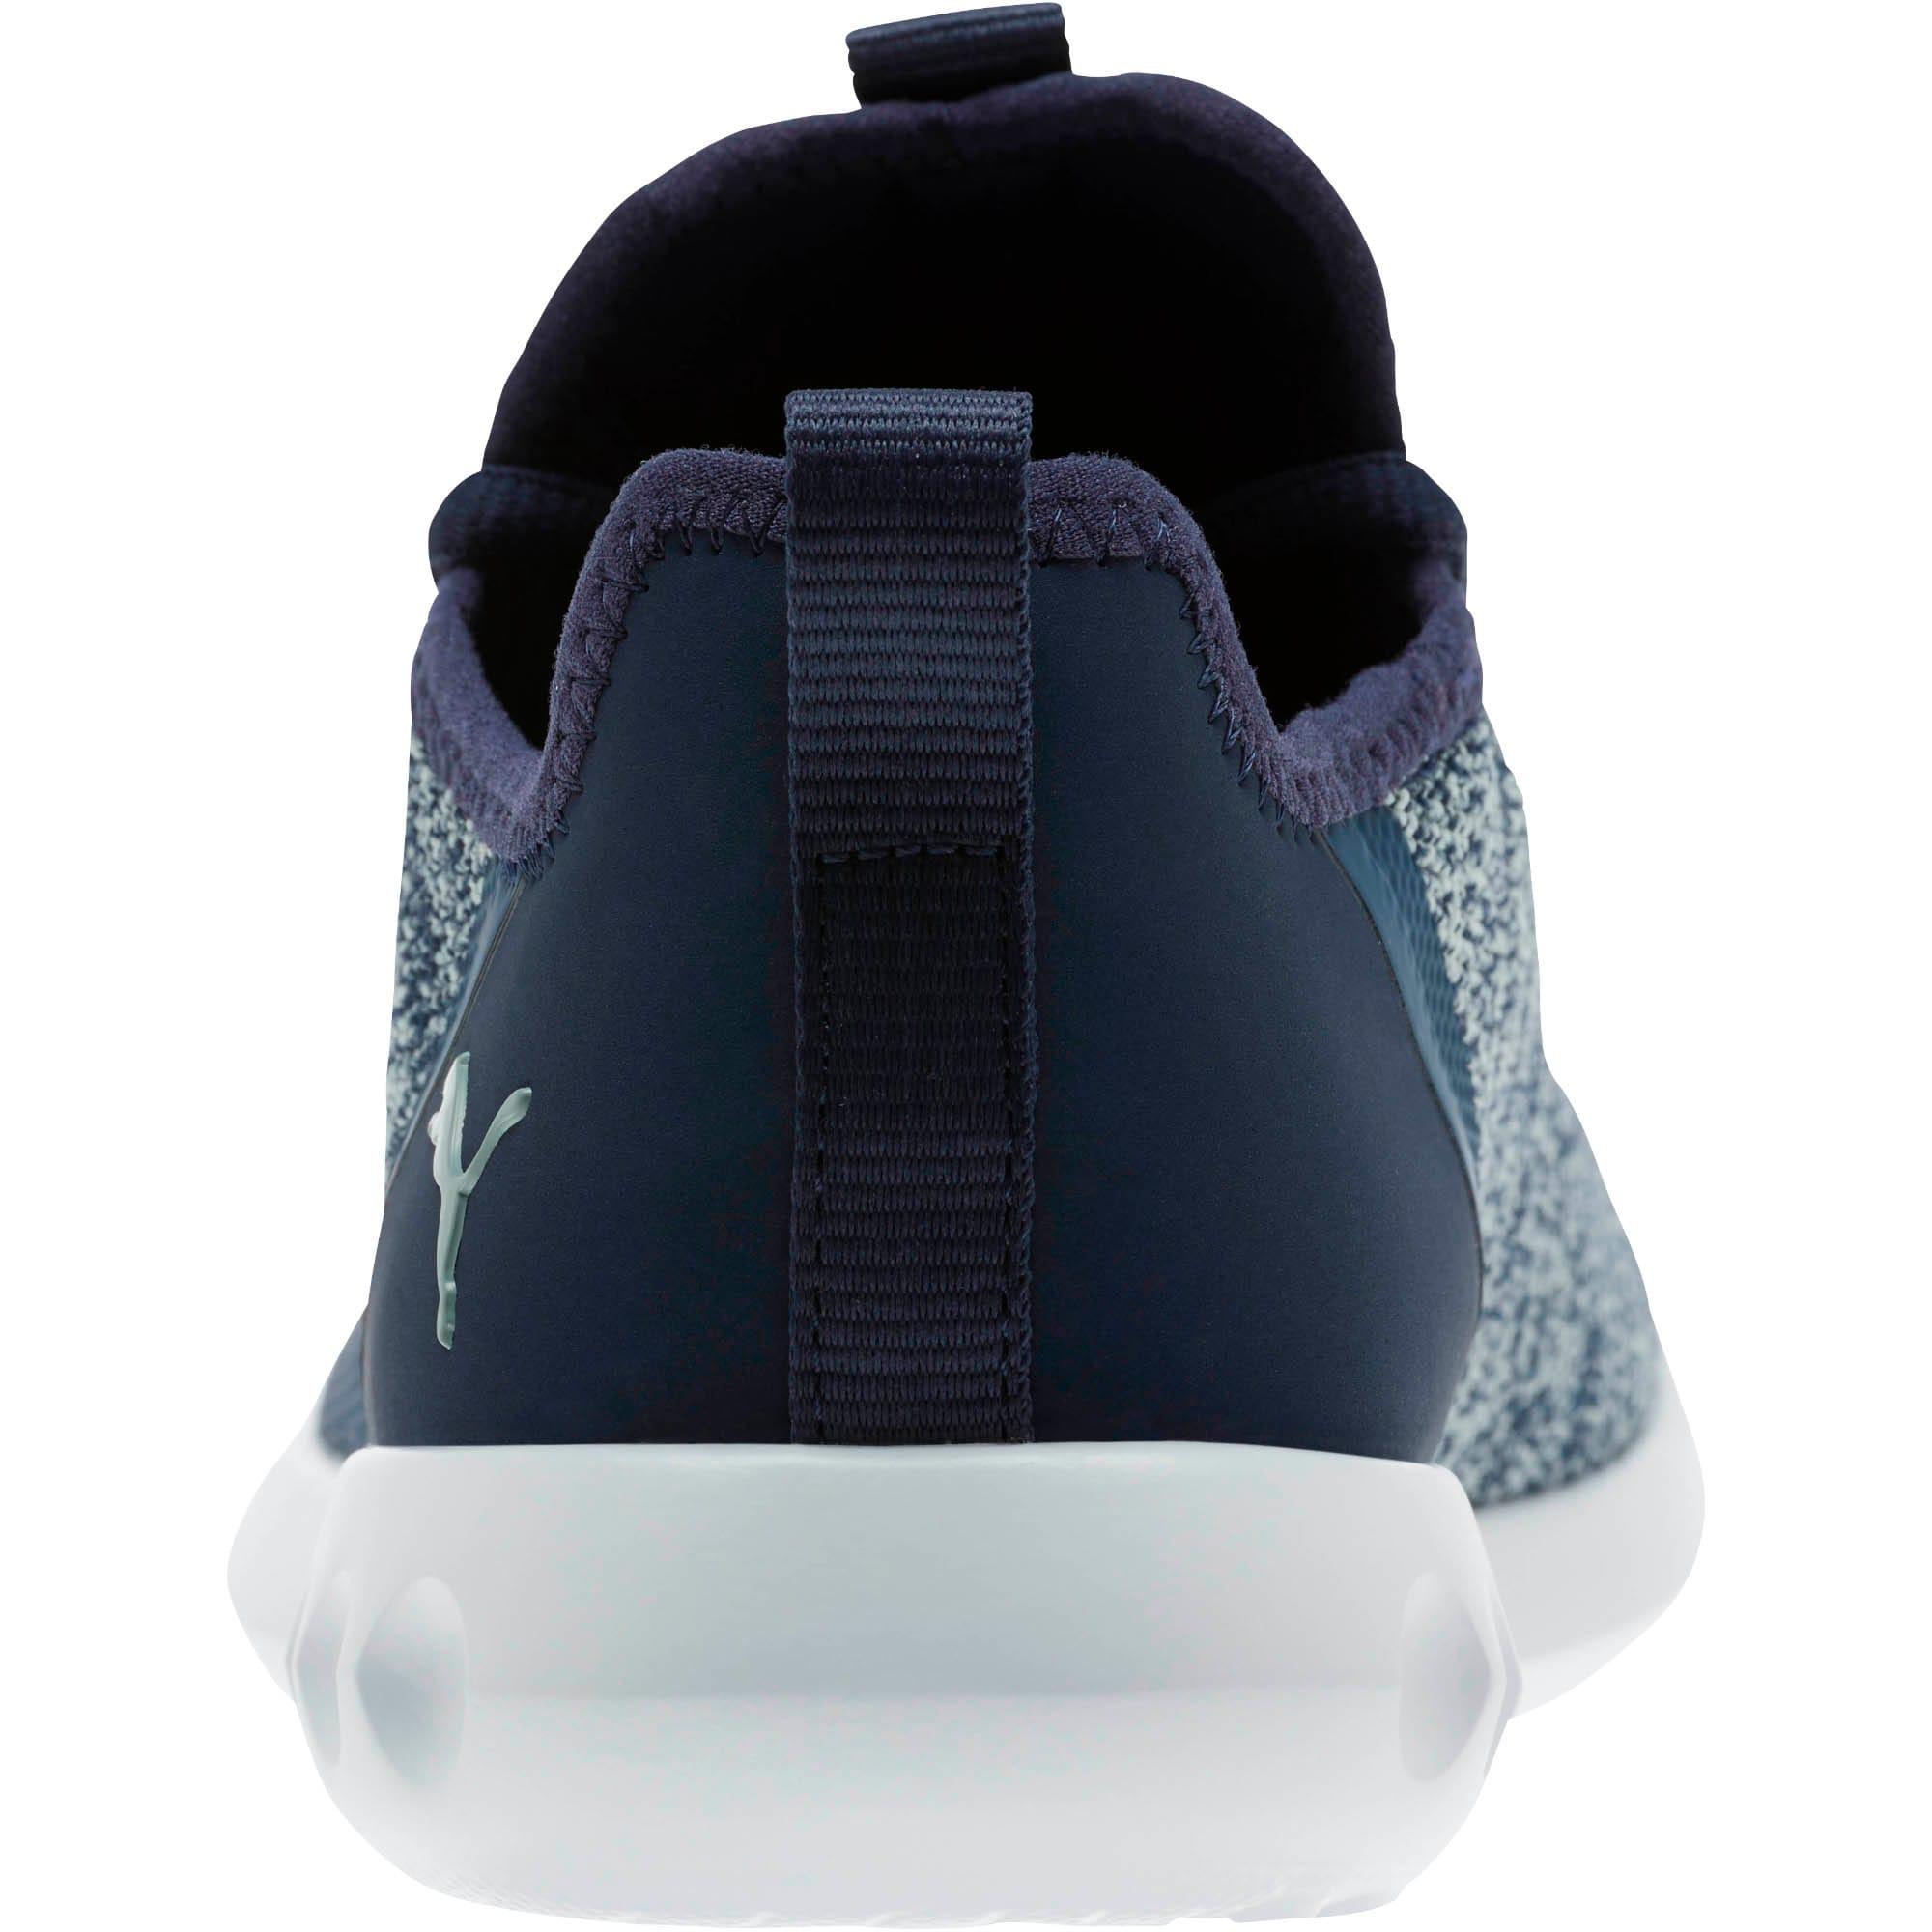 Thumbnail 3 of Carson 2 X Knit Women's Running Shoes, Peacoat-Quarry, medium